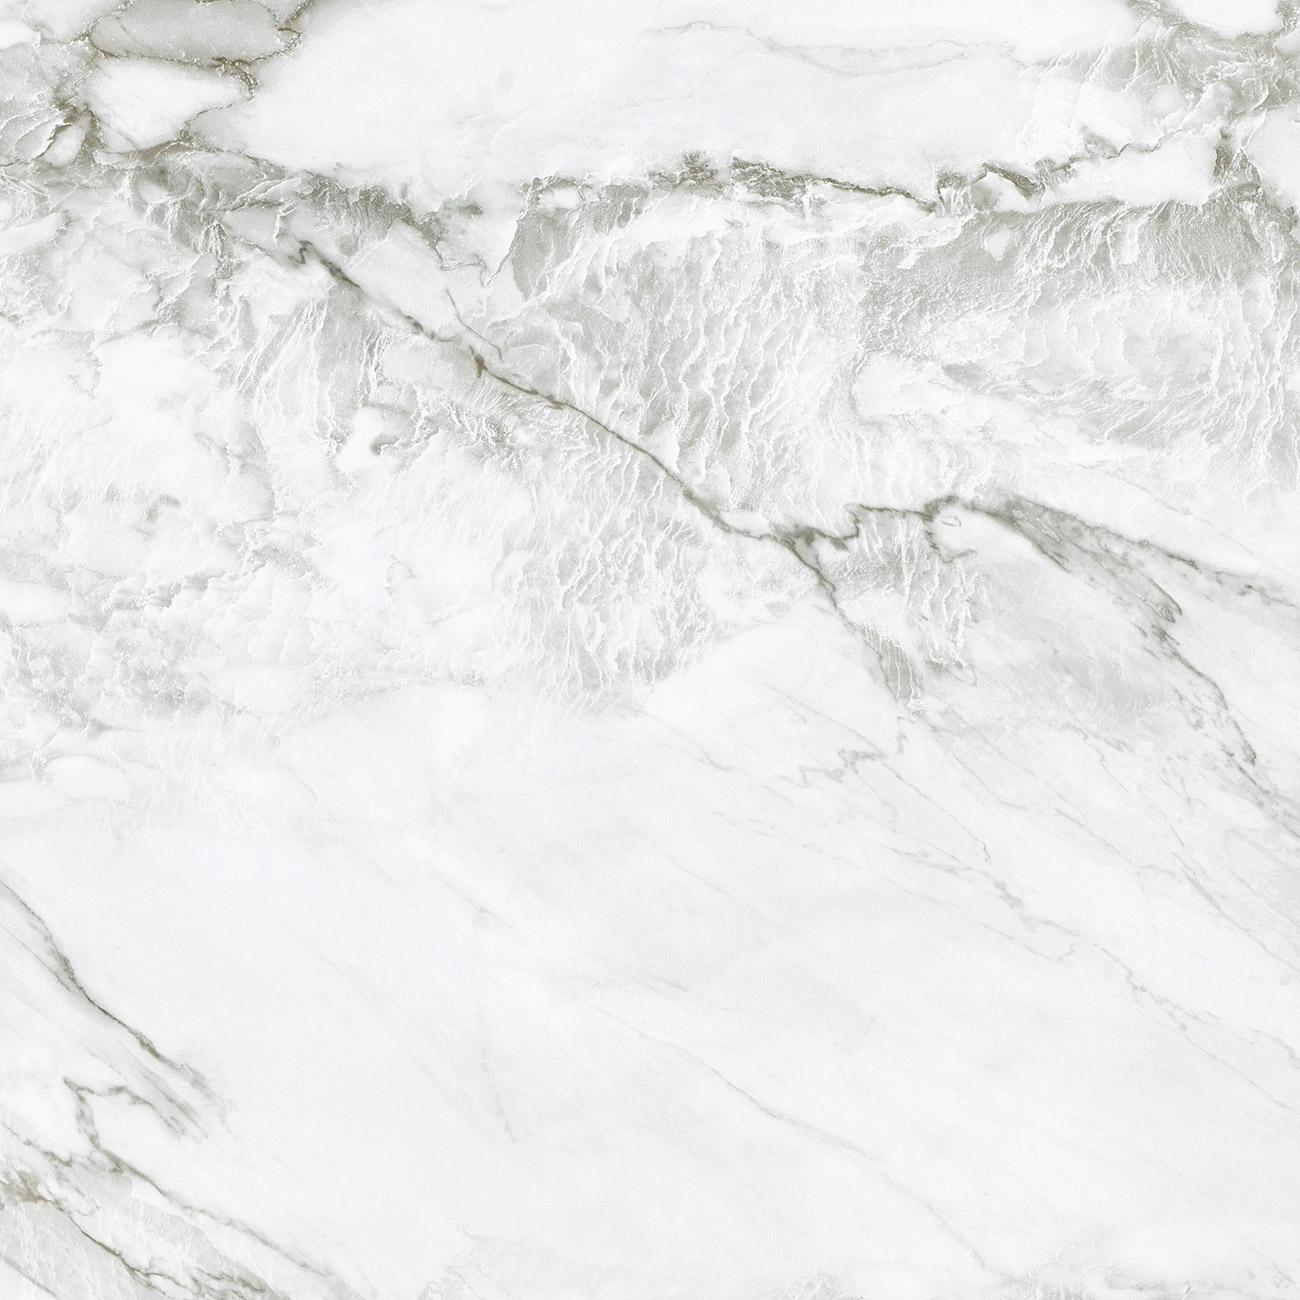 山水白 HYEG90013,900X900mm HYEG26013,600X1200mm